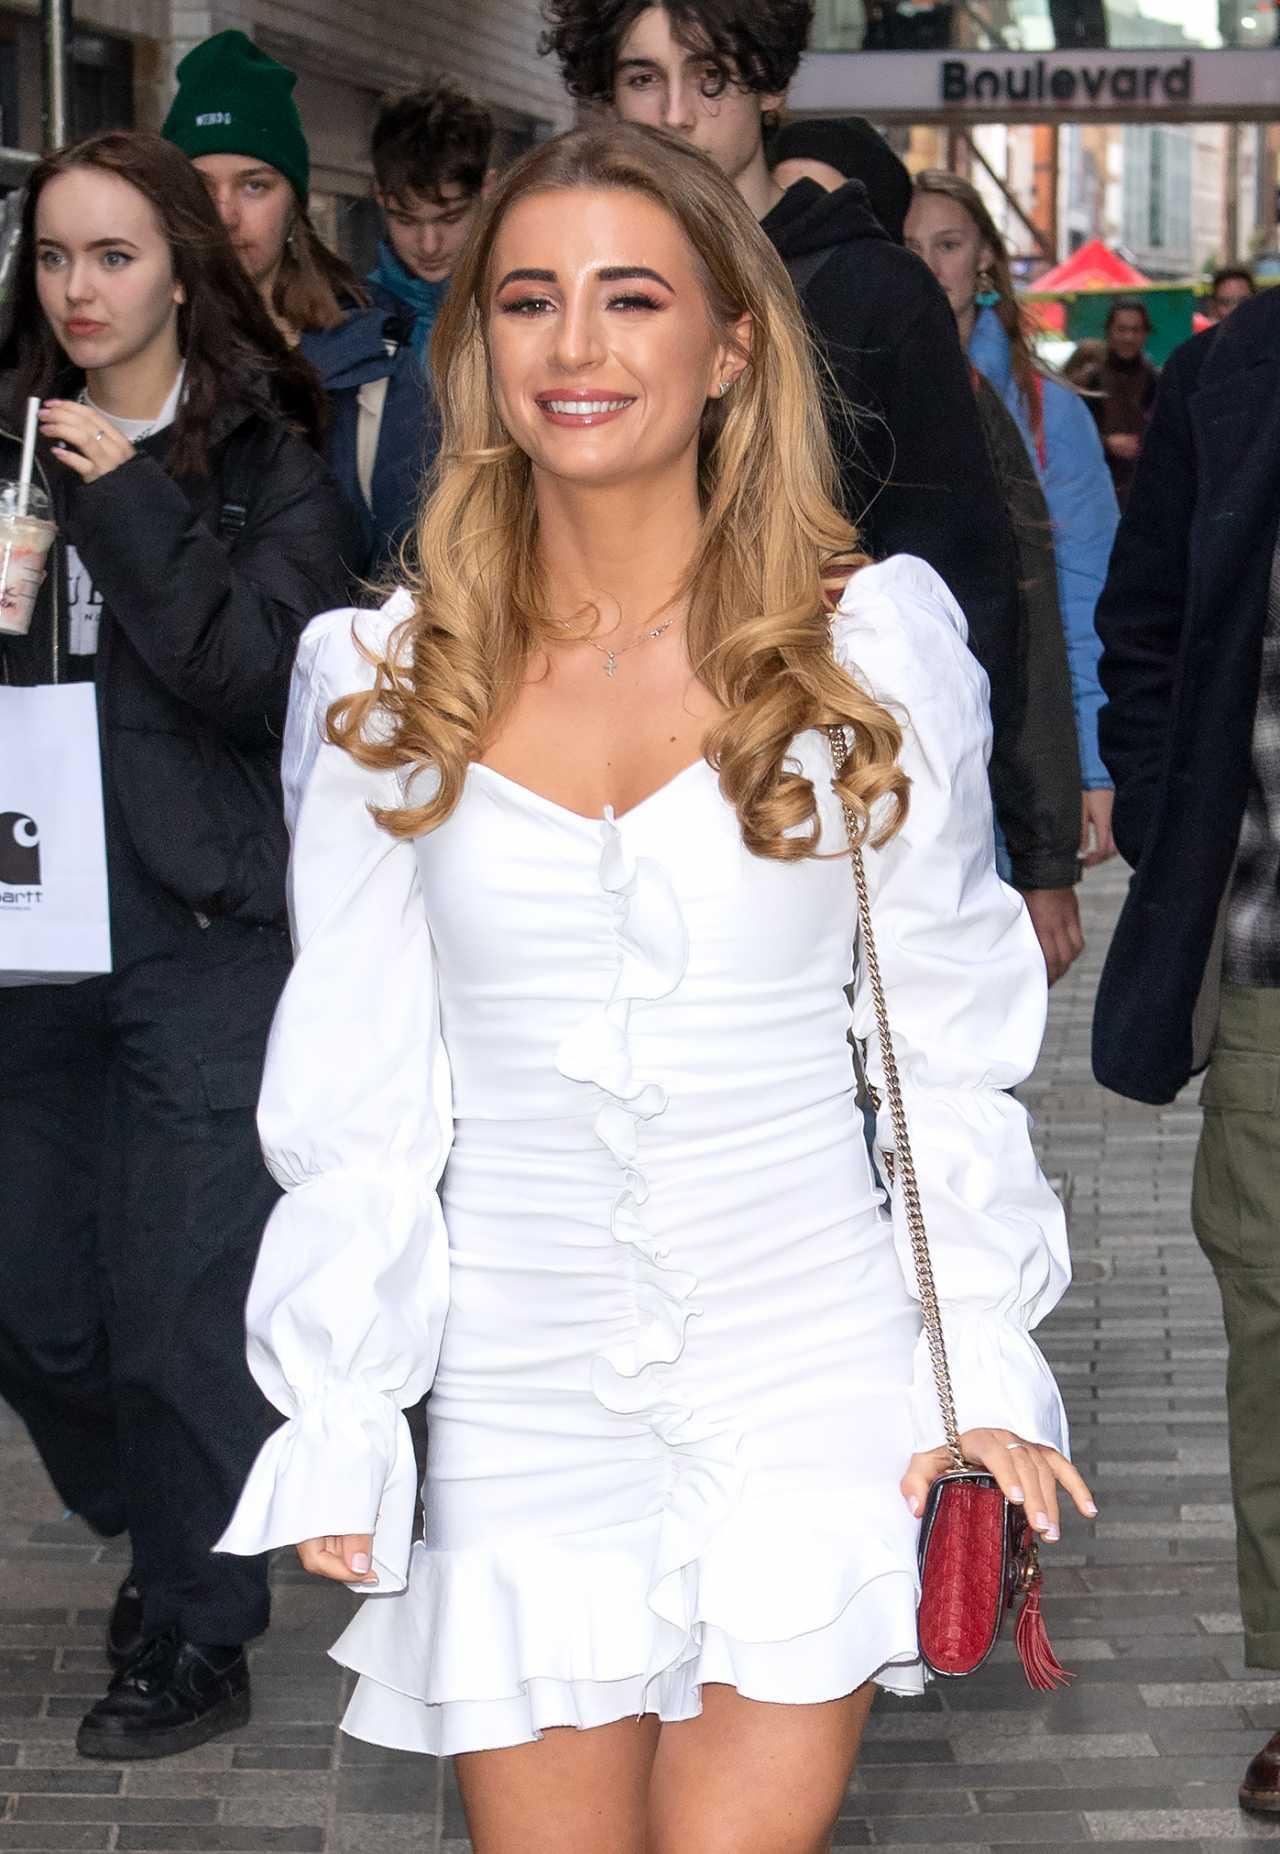 Dani Dyer in white dress spotted in Soho